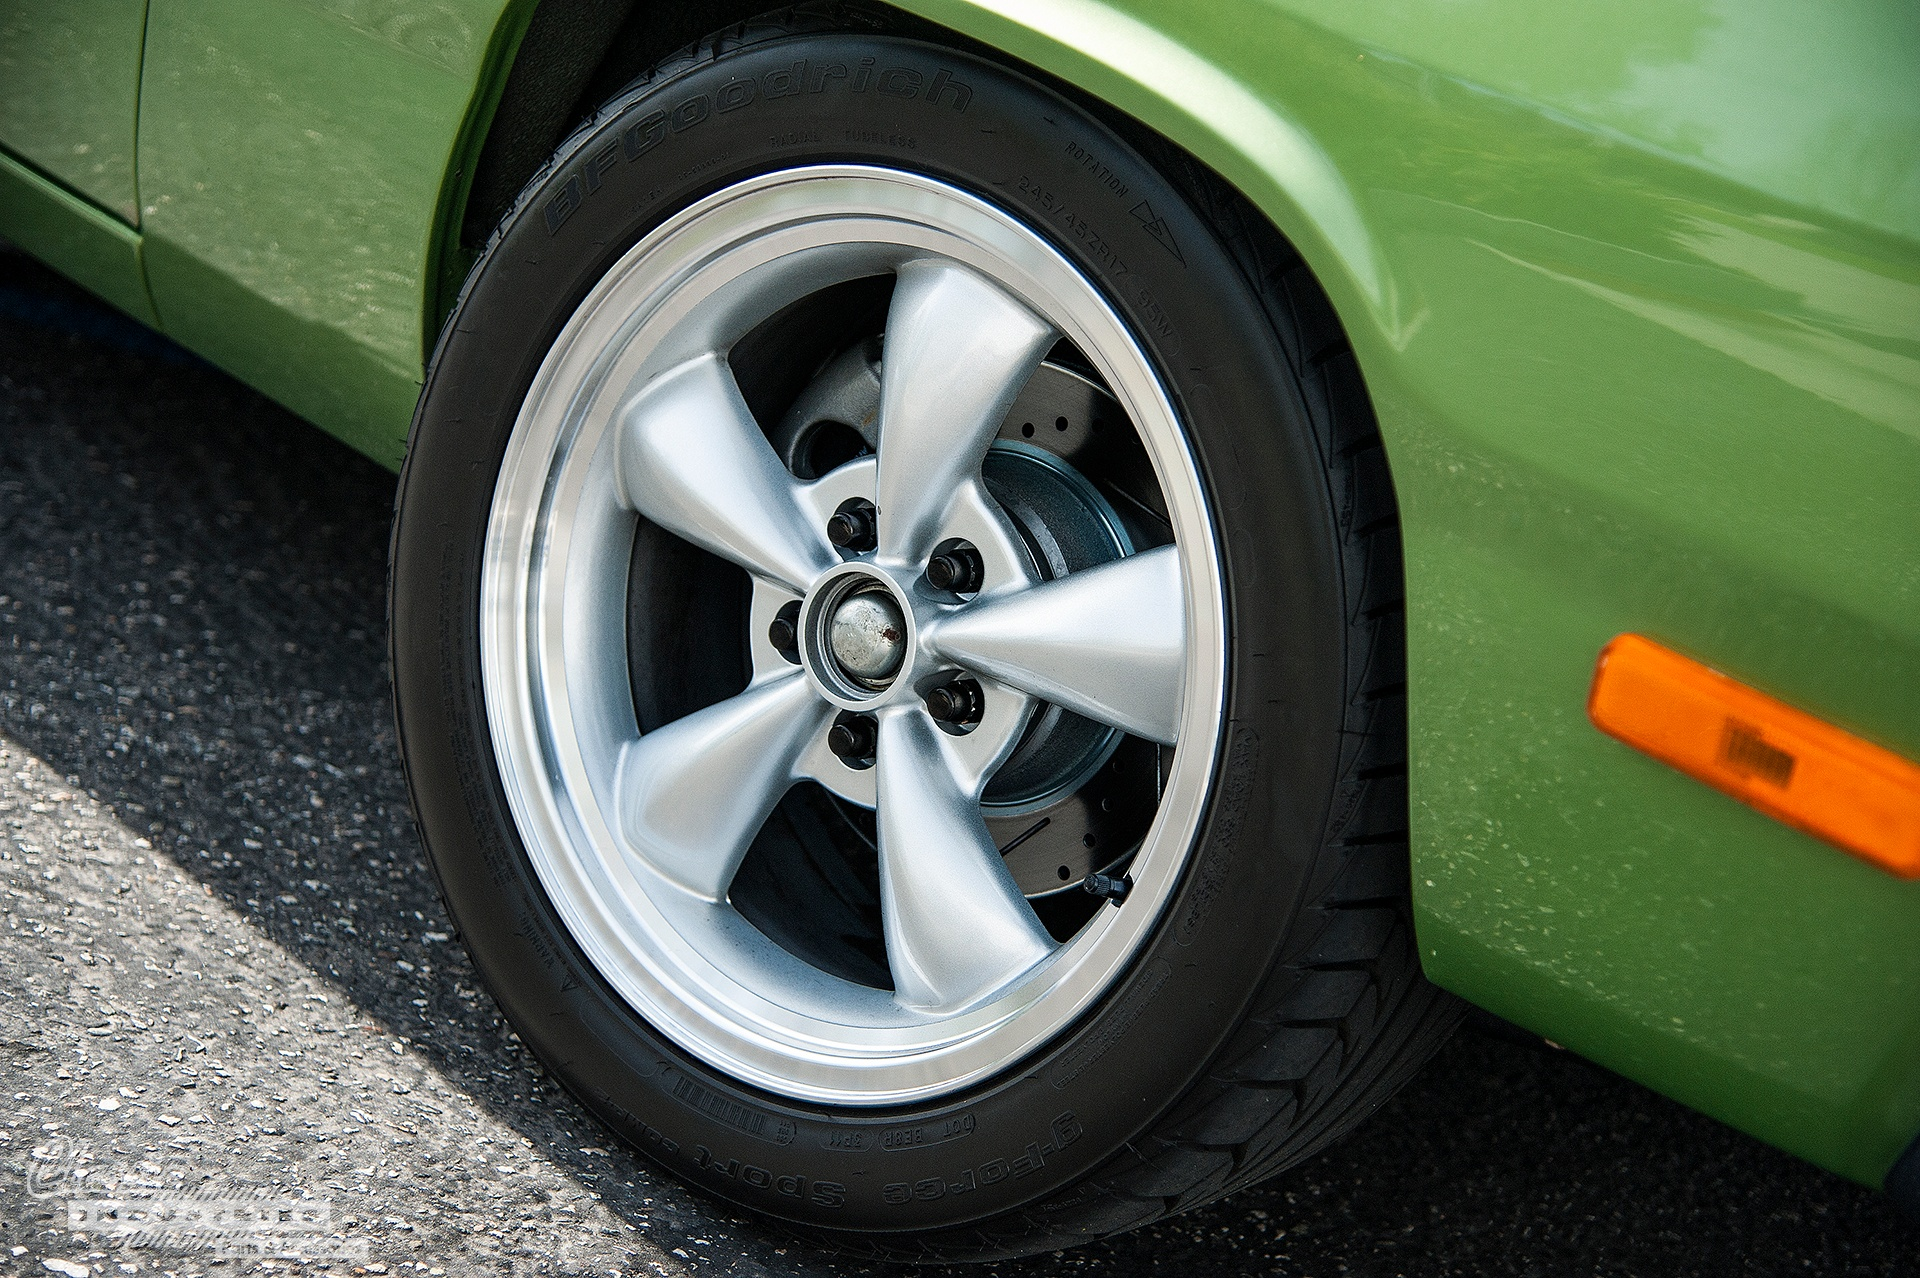 72 Valiant Wheel.jpg